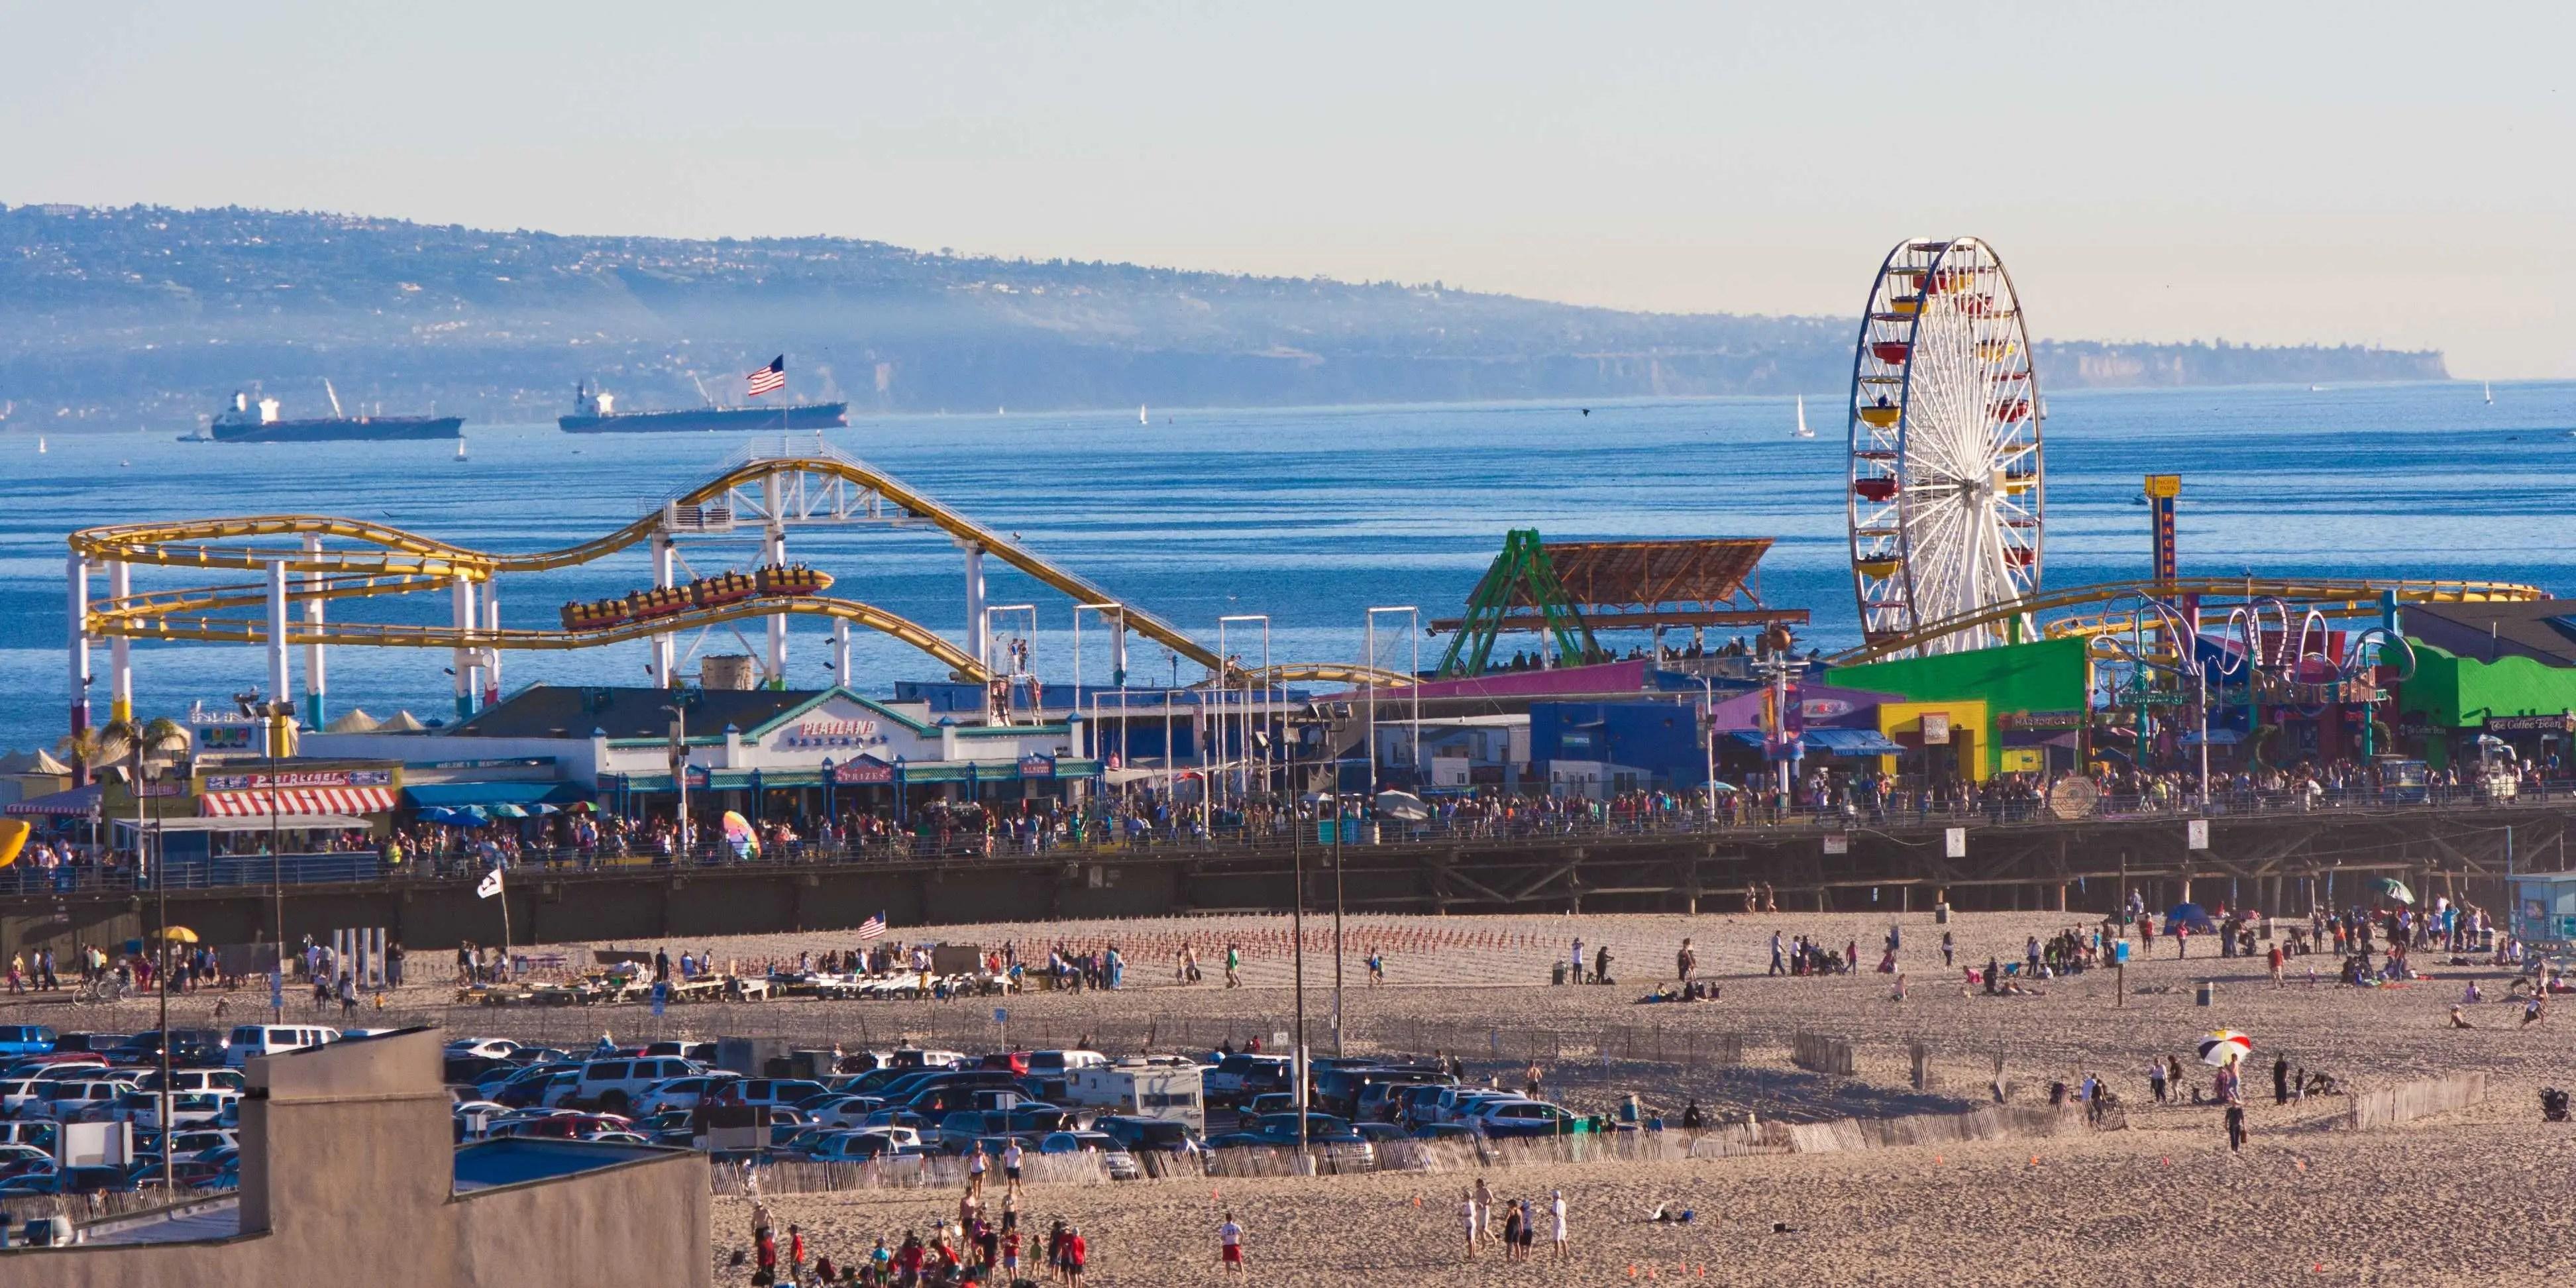 Santa Monica, Calif.